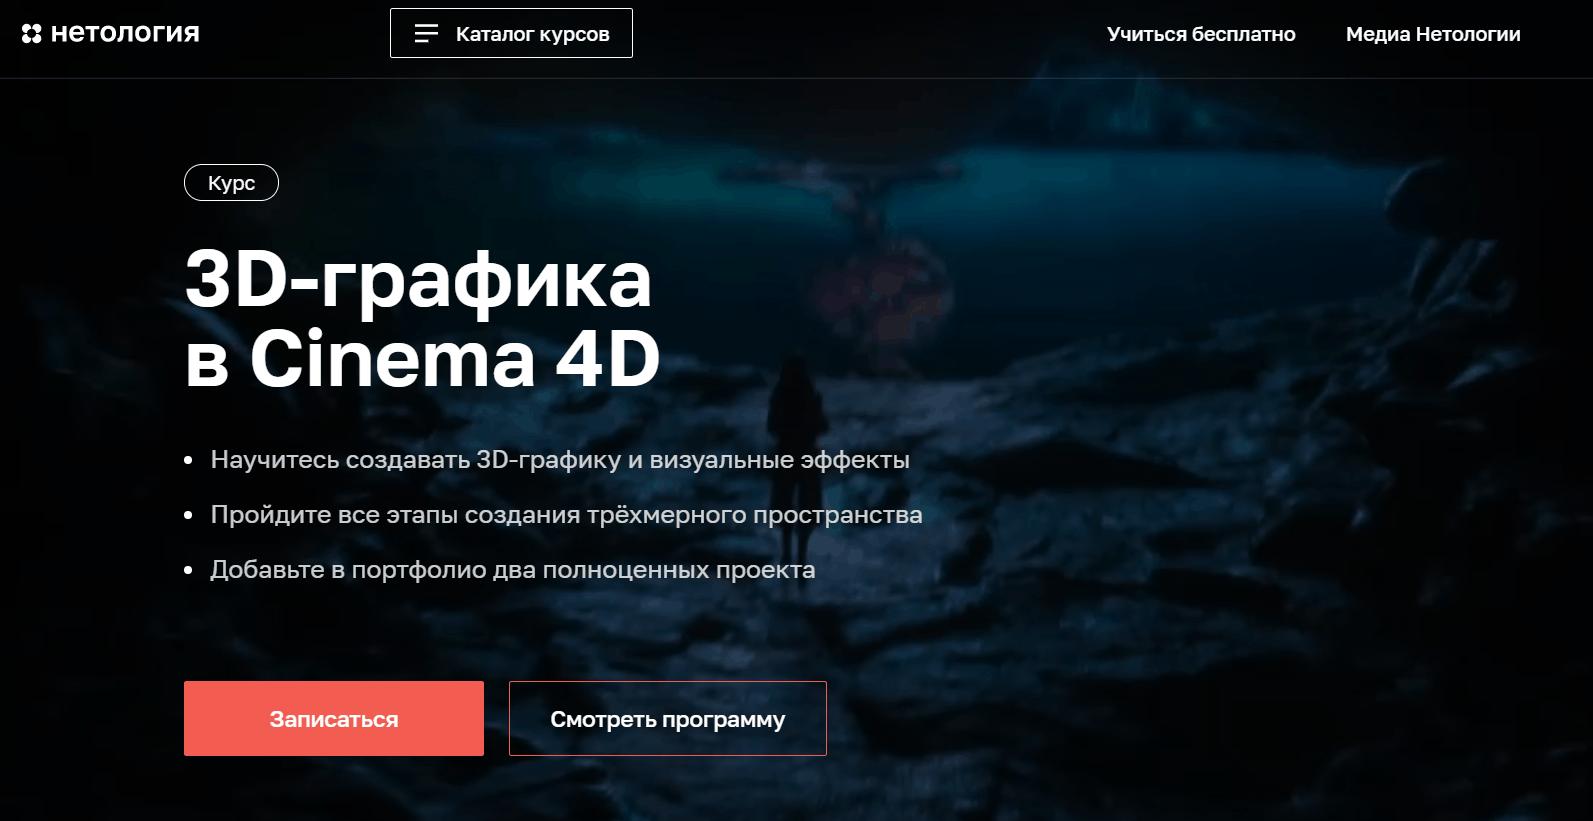 3D-графика в Cinema 4D — курс